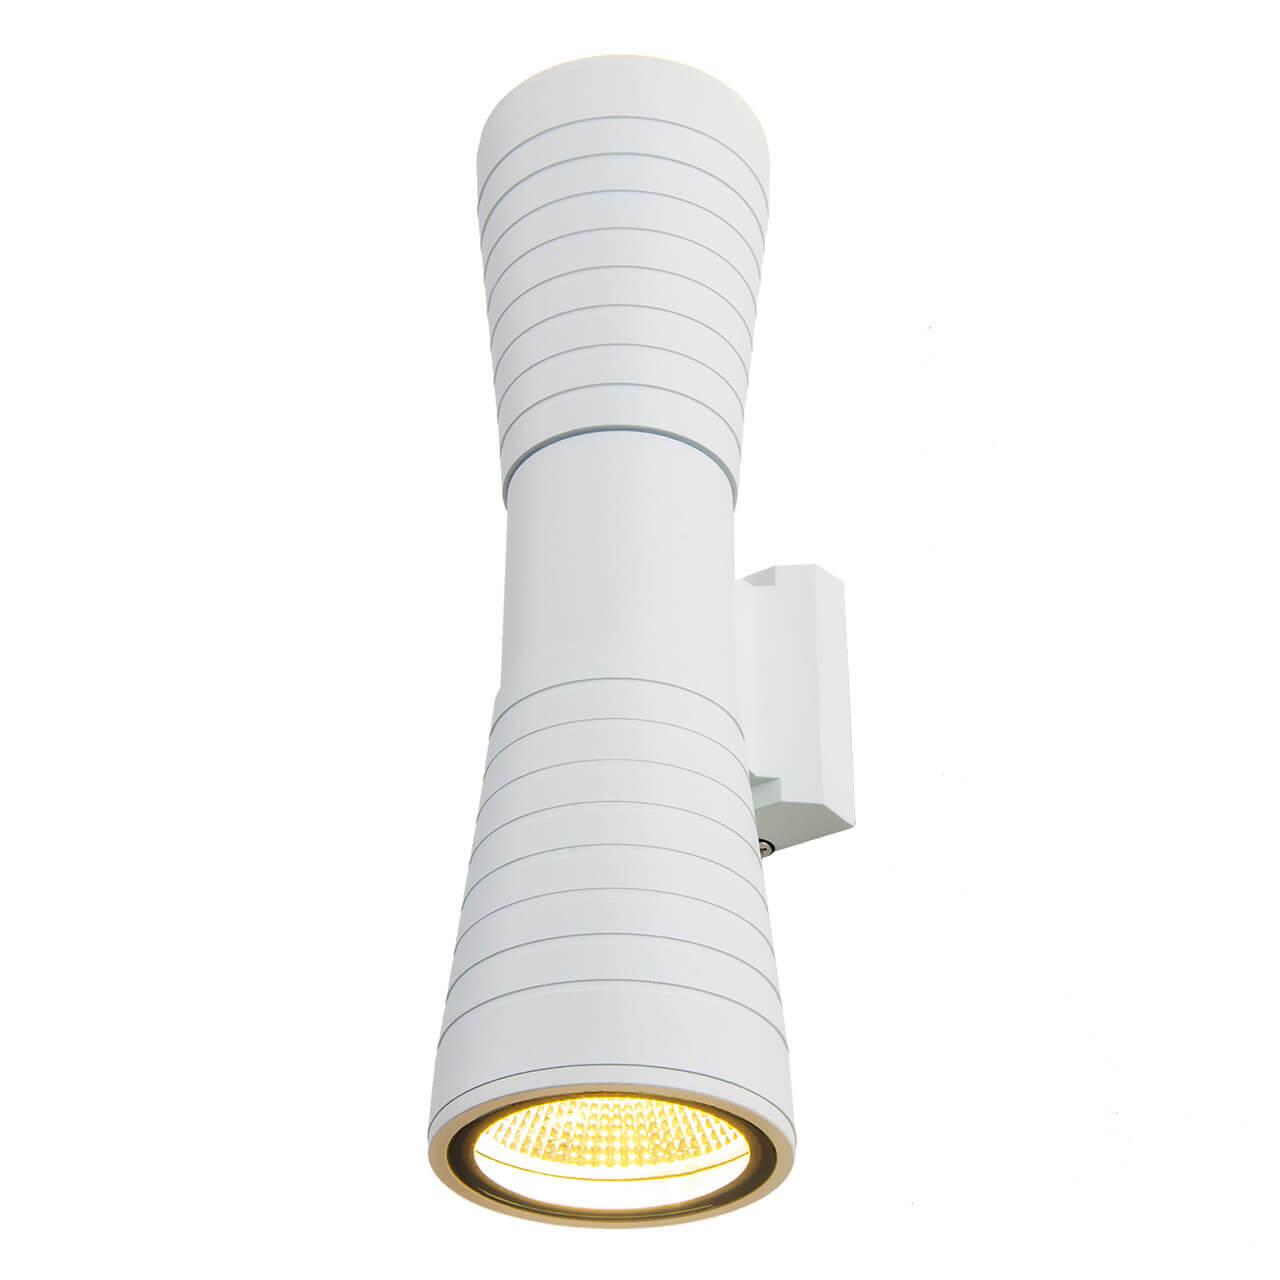 Светильник Elektrostandard 4690389138614 Techno LED